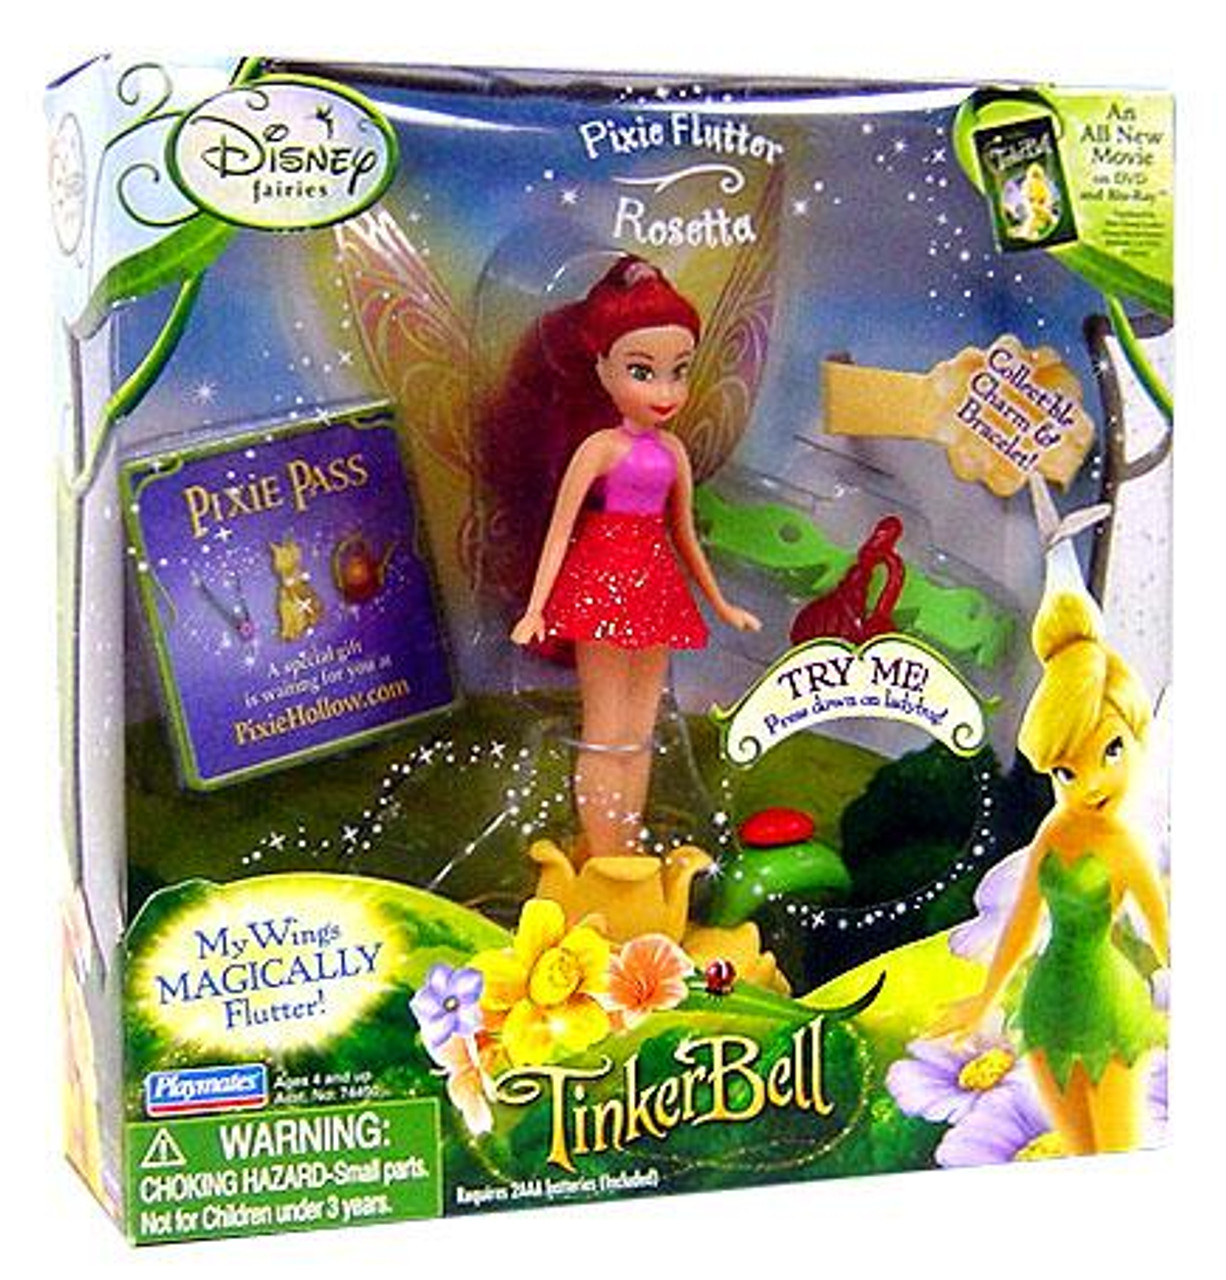 Disney Fairies Pixie Flutter Rosetta Figure